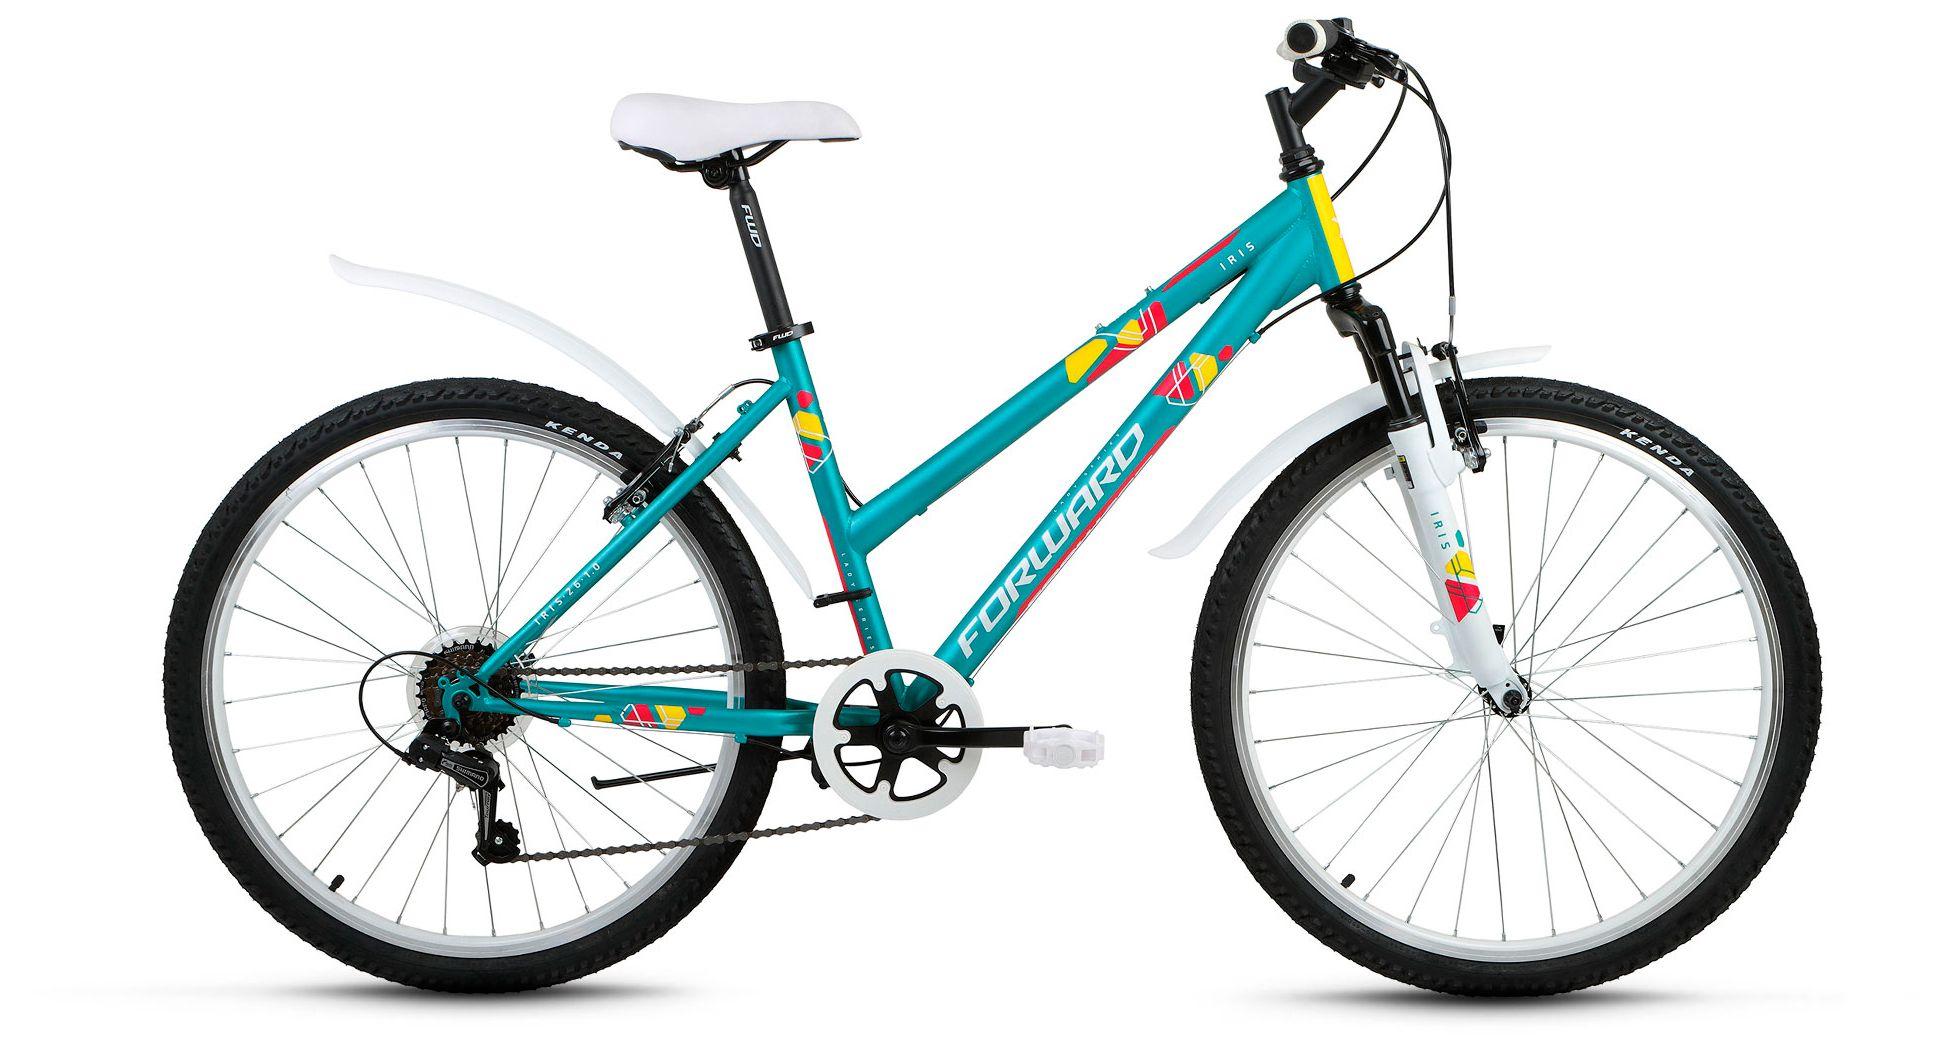 Велосипед Forward Iris 26 1.0 2017 велосипед forward iris 26 1 0 2017